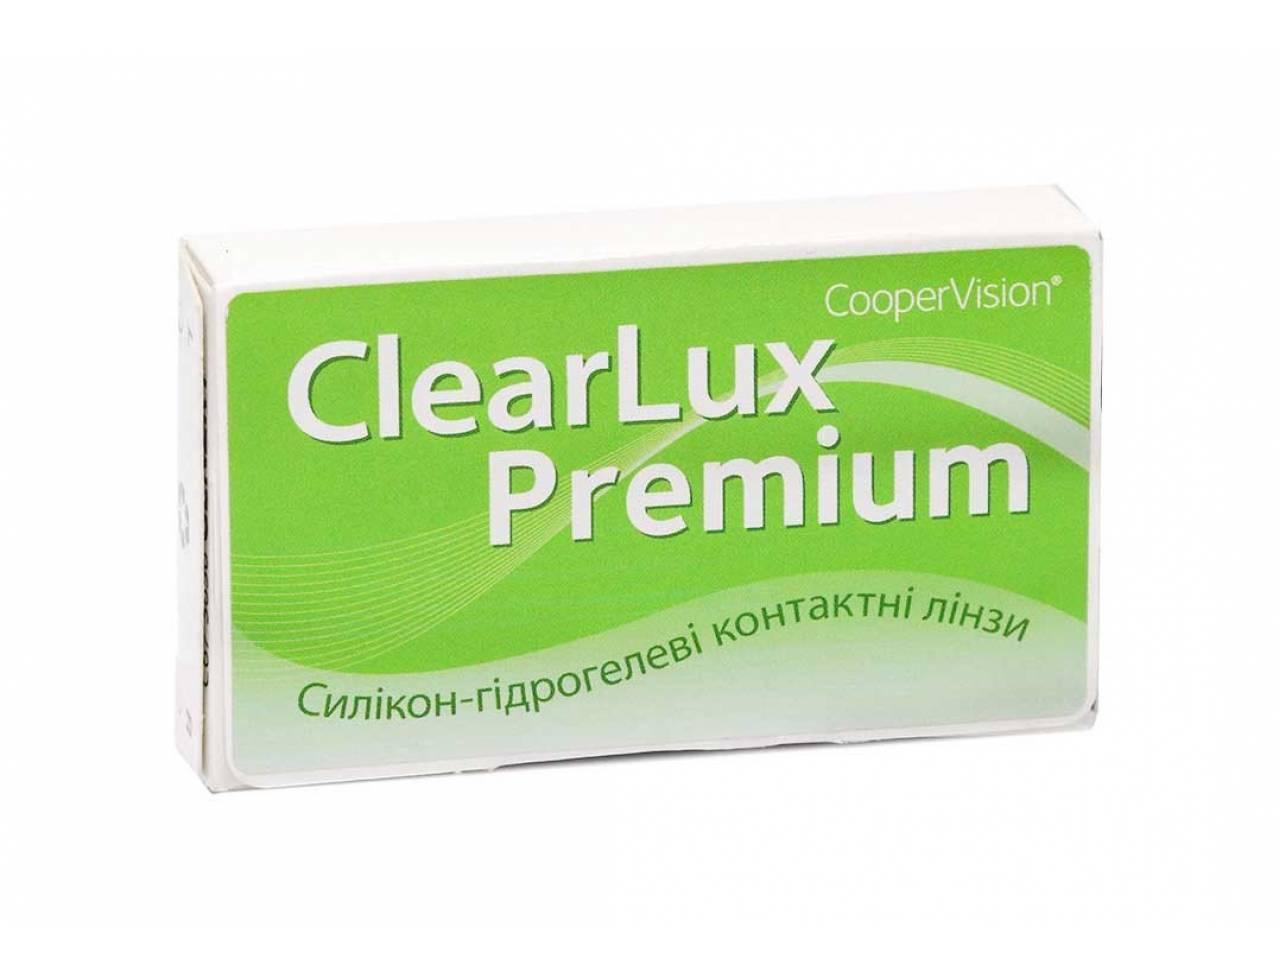 Месячные контактные линзы Cooper Vision ClearLux Premium